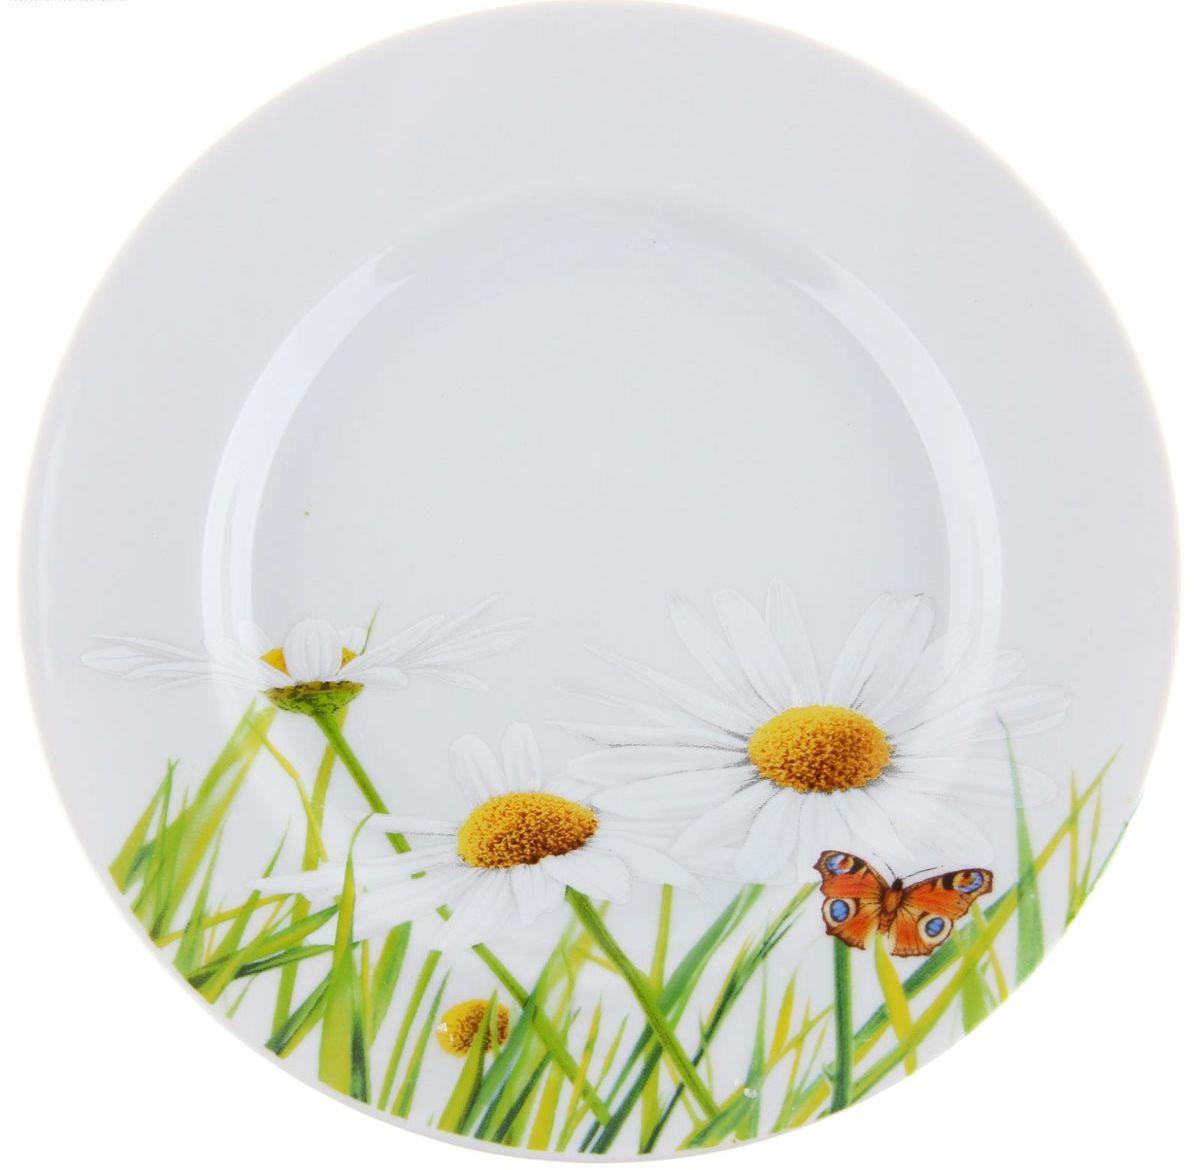 Тарелка мелкая Идиллия. Ромашка, диаметр 17 см1280308